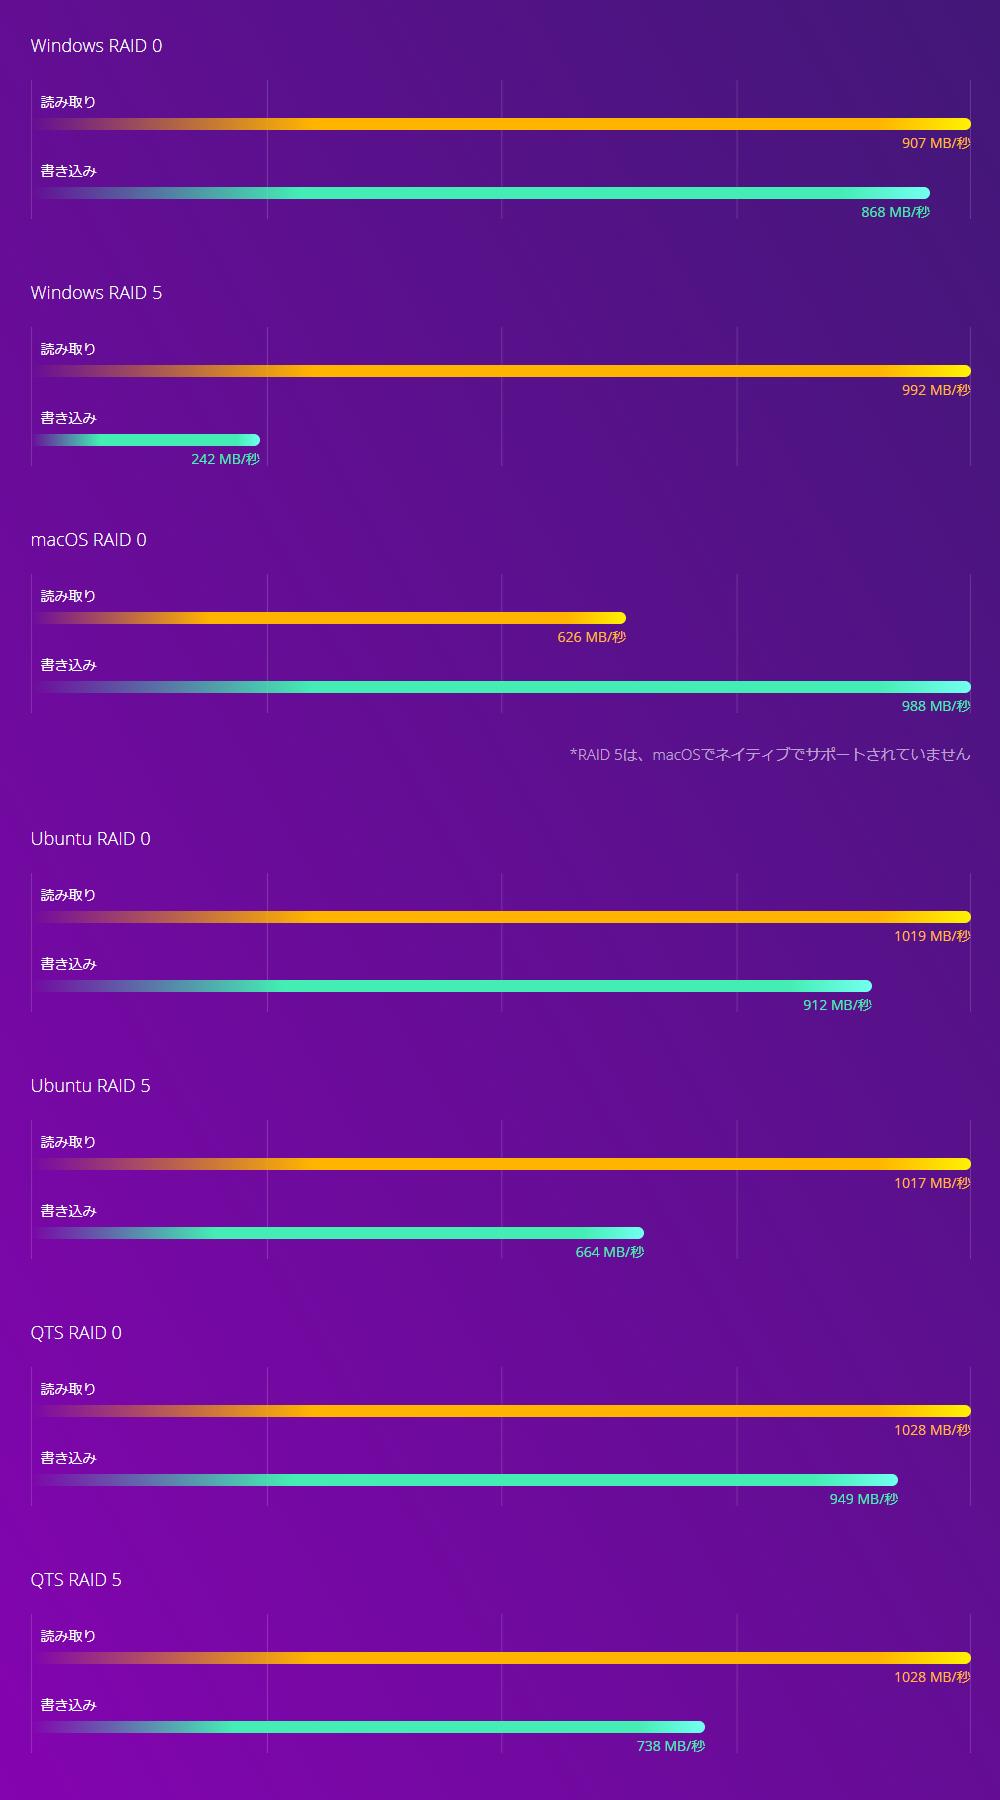 benchmark_tl-d800c.png